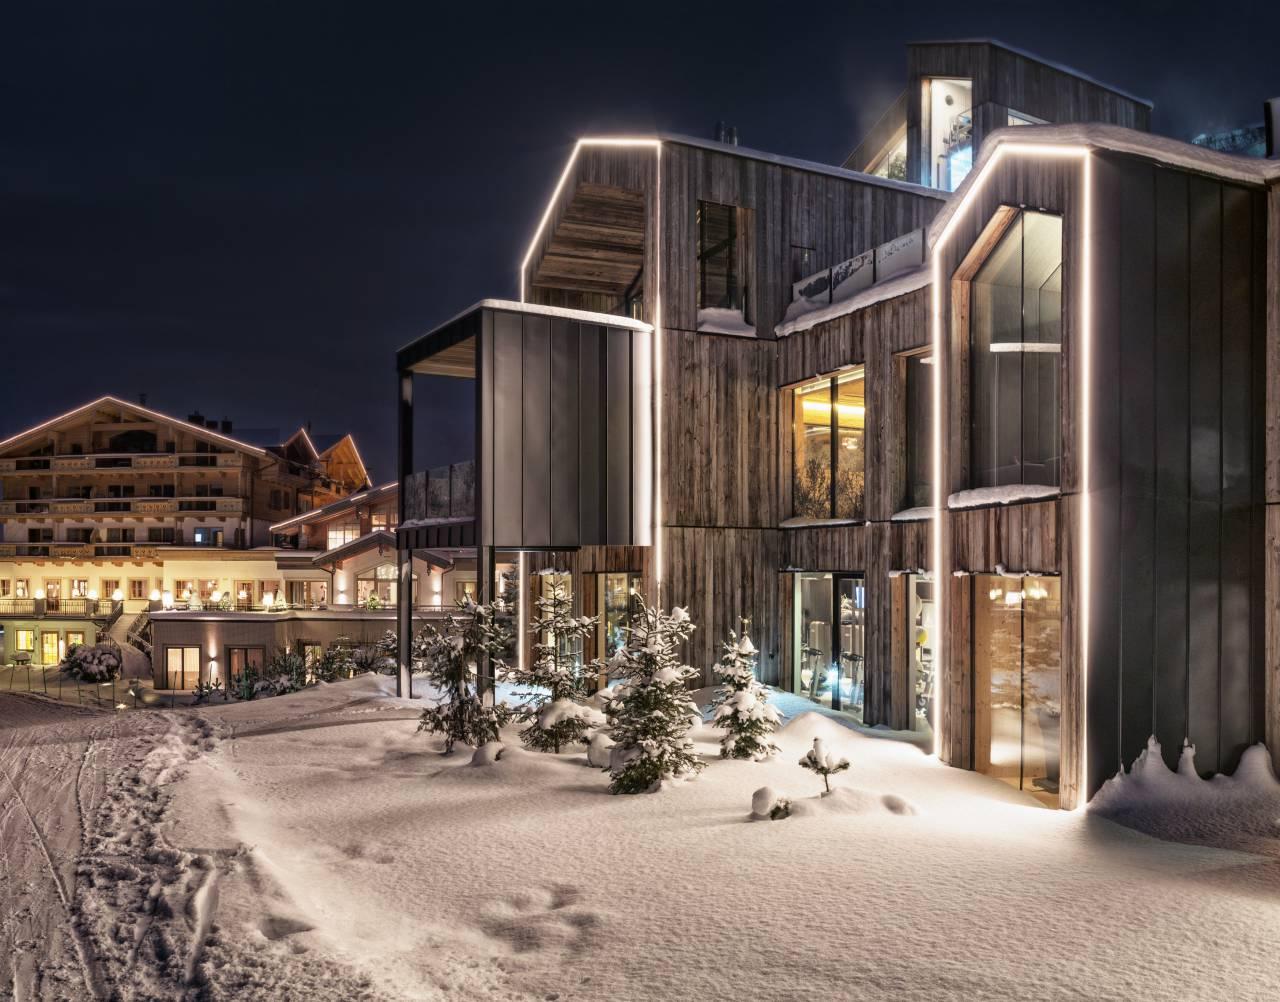 Naturhotel Forsthofgut Winter